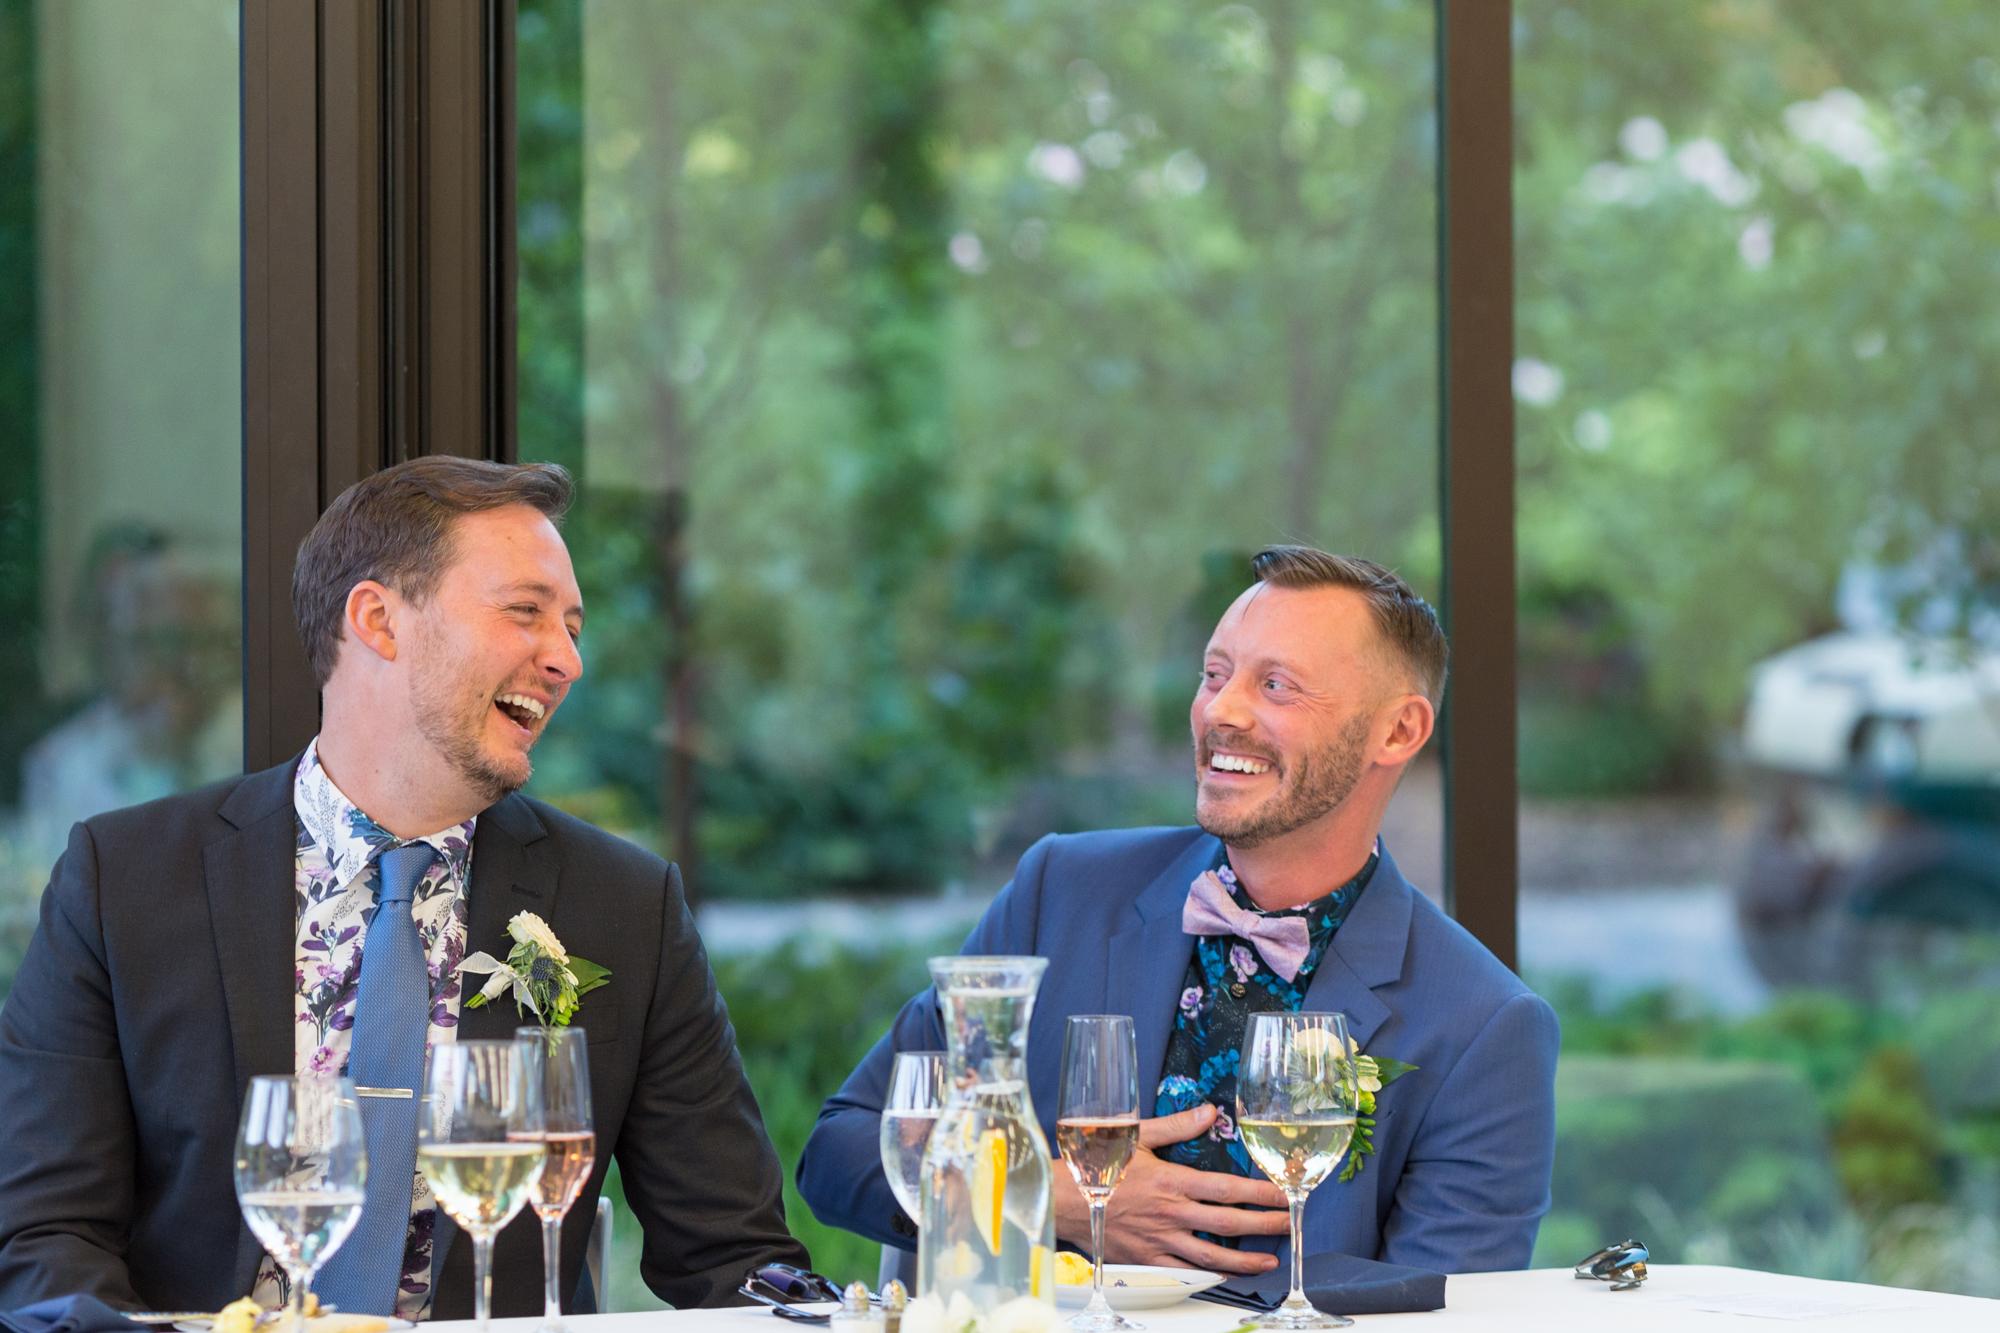 same-sex-wedding-red-butte-garden-44.jpg